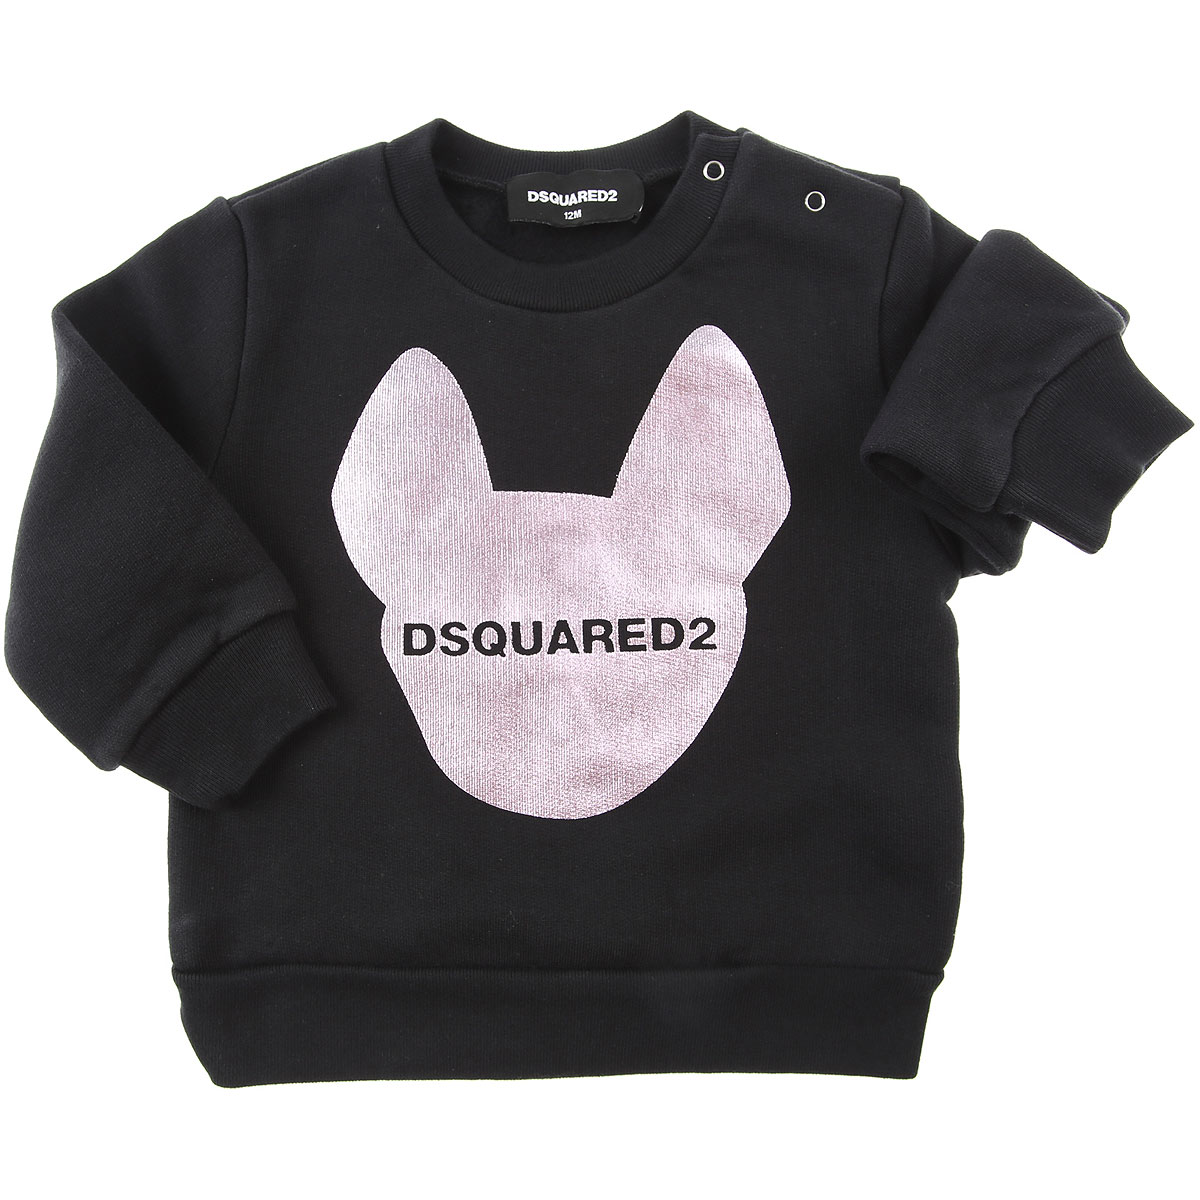 Dsquared2 Baby Sweatshirts & Hoodies for Girls On Sale, Black, Cotton, 2019, 12M 18M 1M 2Y 6M 9M